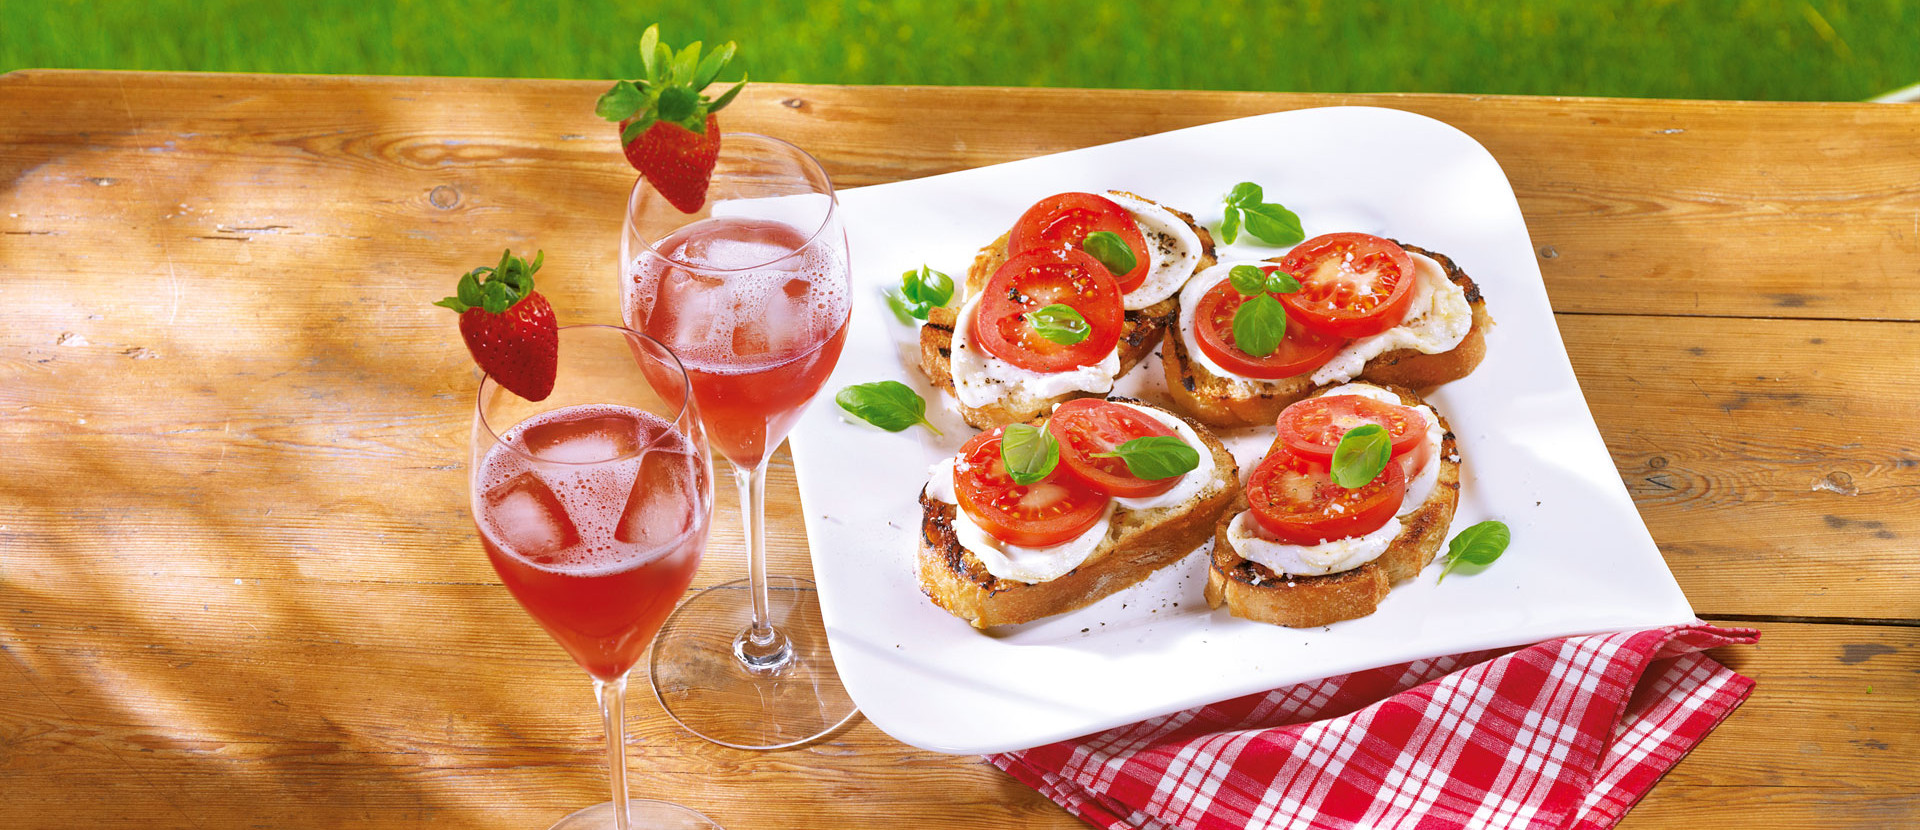 Pink Prosseco mit Erdbeere und Roestbrot